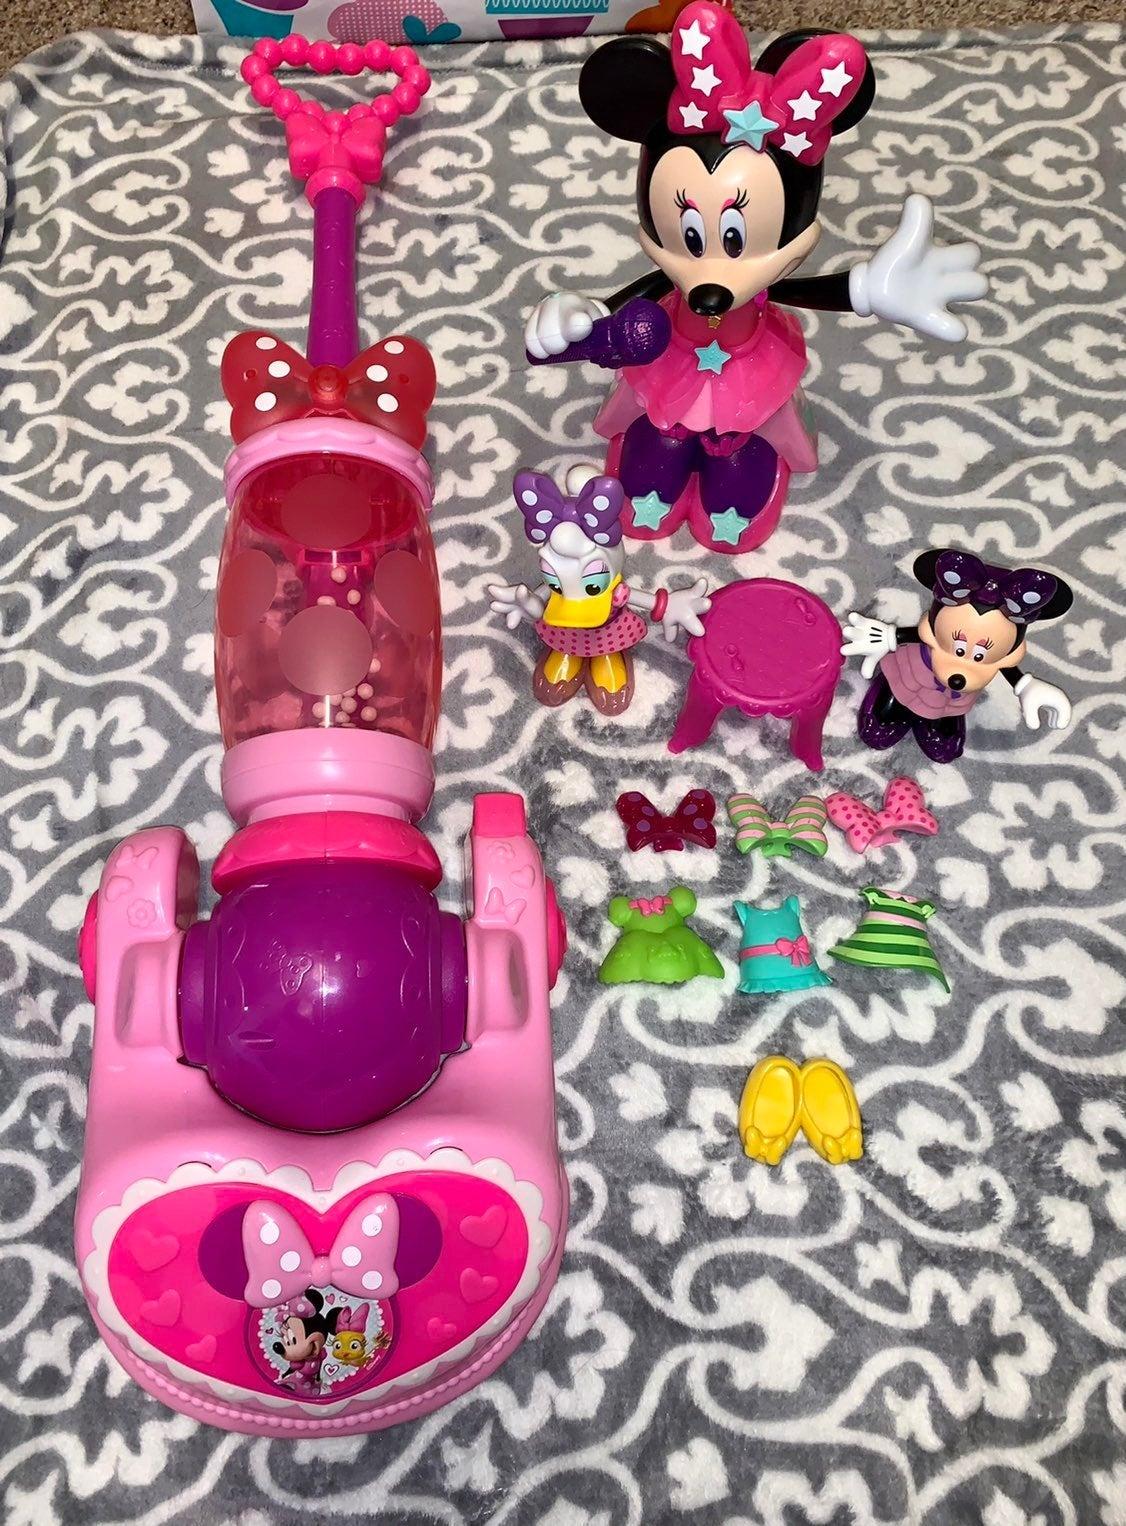 Minnie Mouse Pop Superstar,Vacuum & More